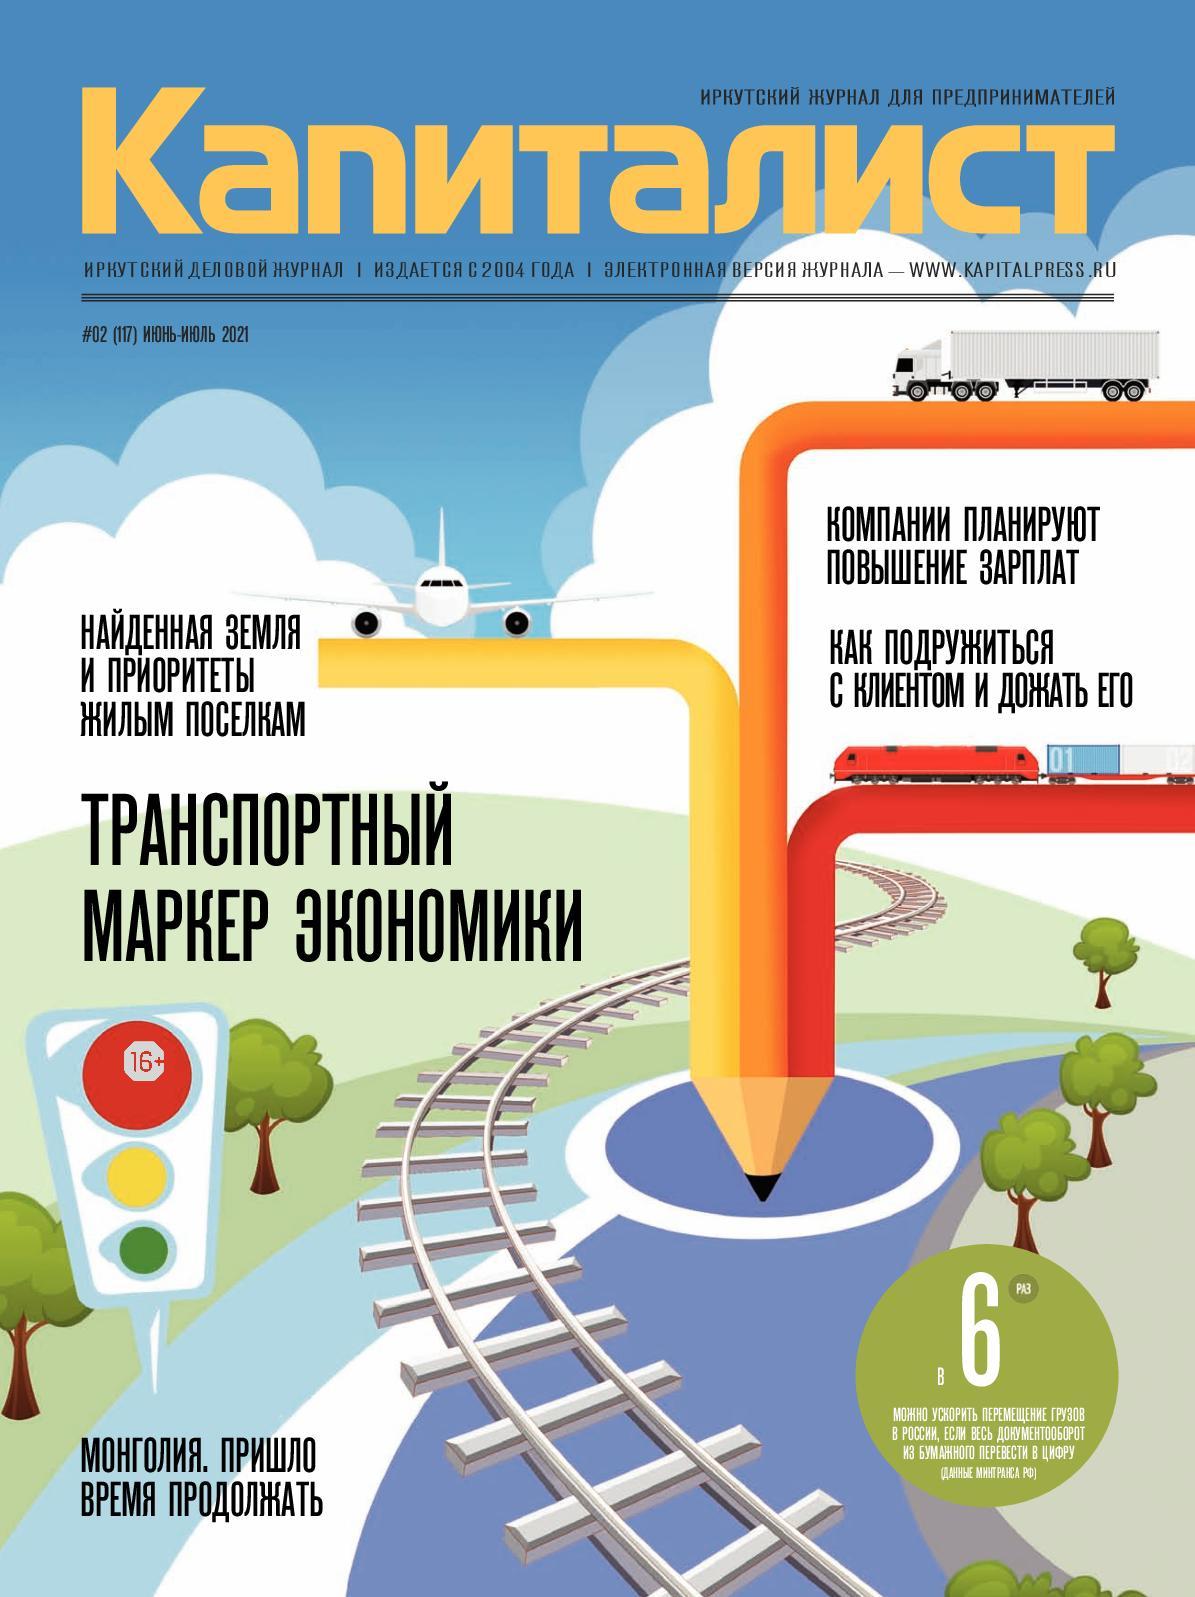 Журнал Капиталист № 06(105), ноябрь-декабрь, 2018